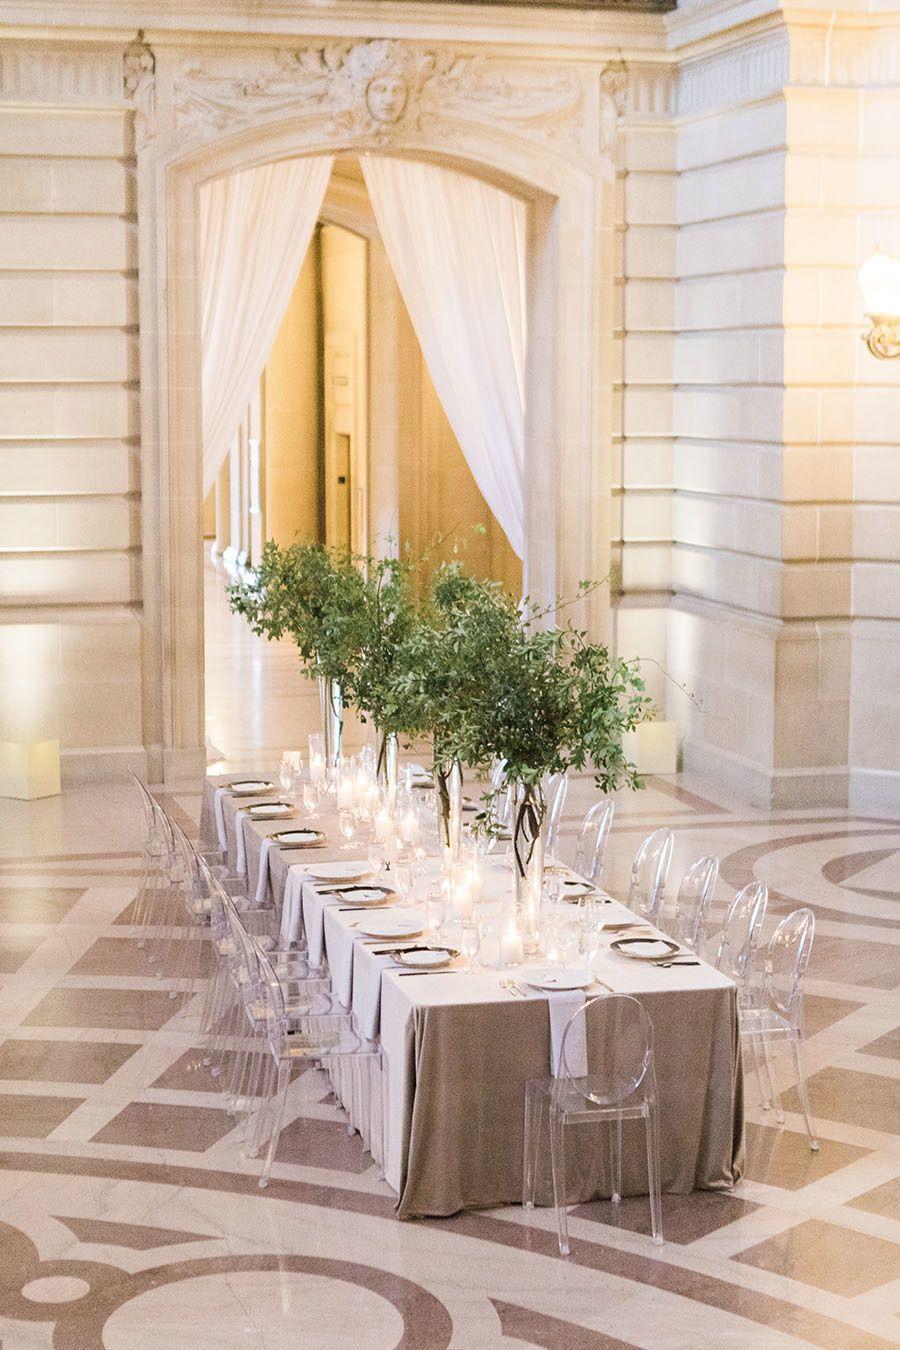 Wedding room decoration ideas 2018  San Francisco City Hall Wedding with a Modern Flair in